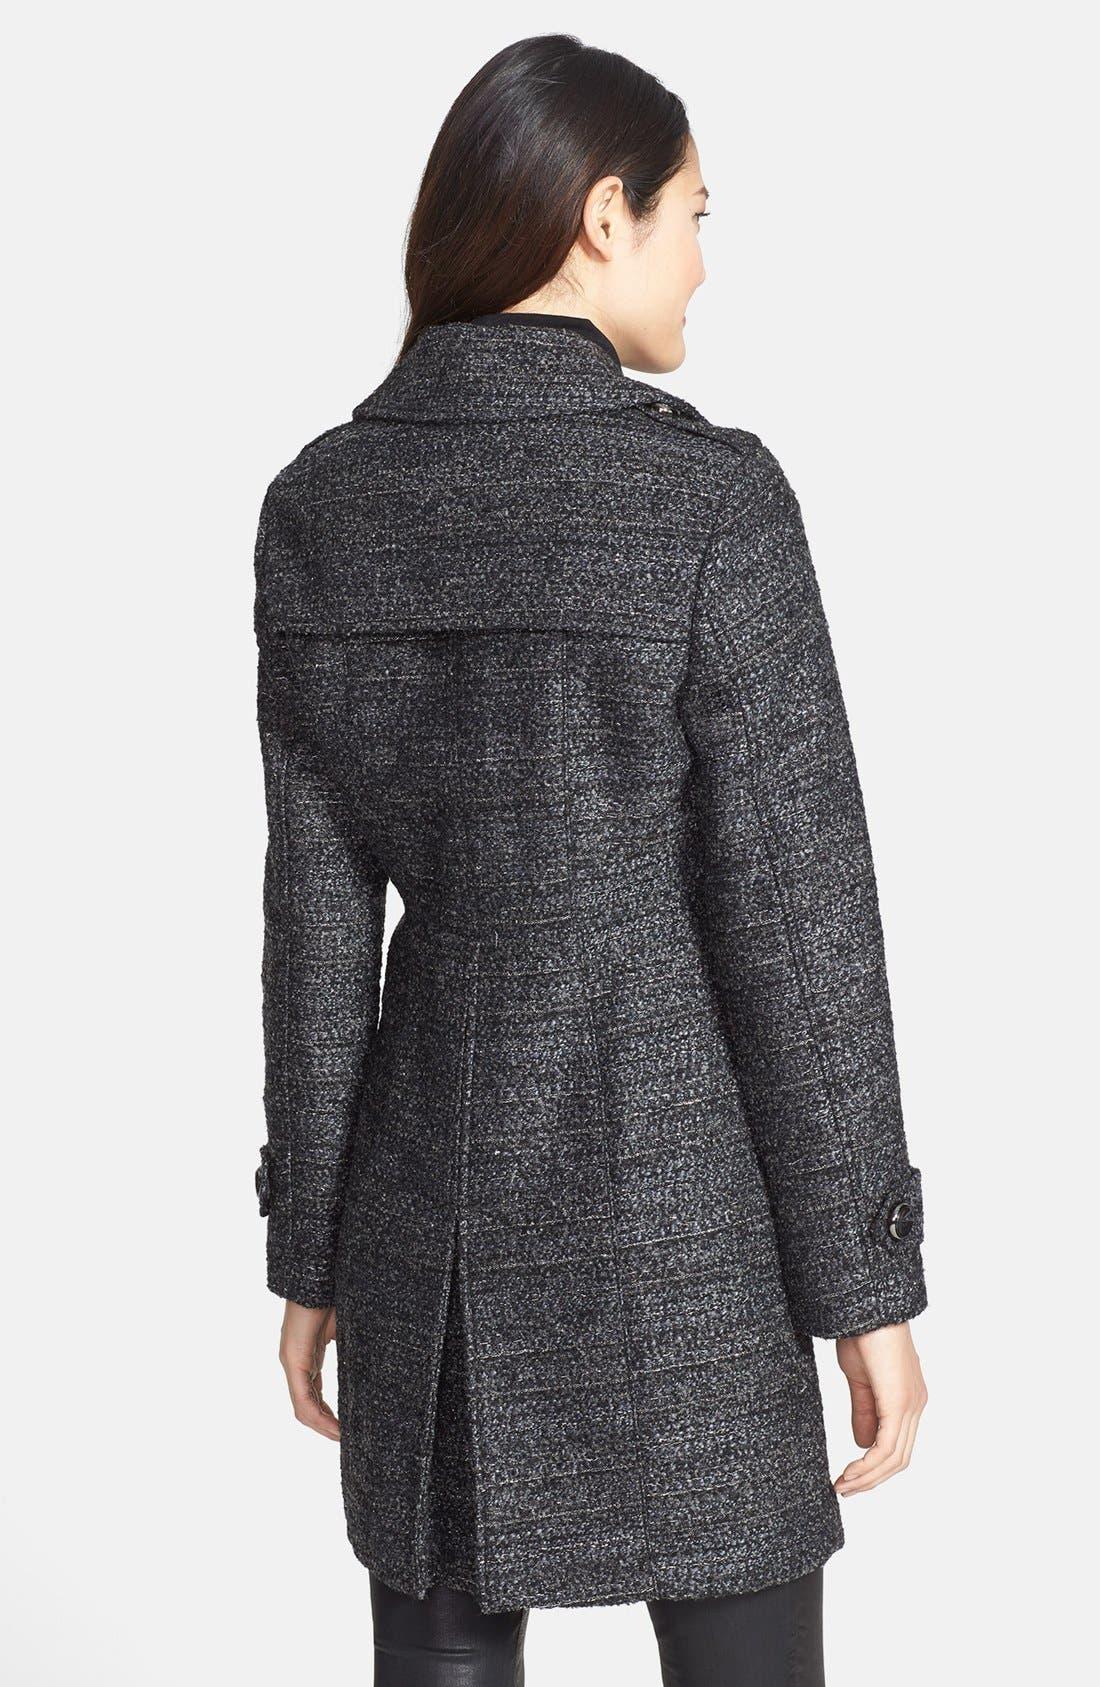 Metallic Tweed Walking Coat,                             Alternate thumbnail 3, color,